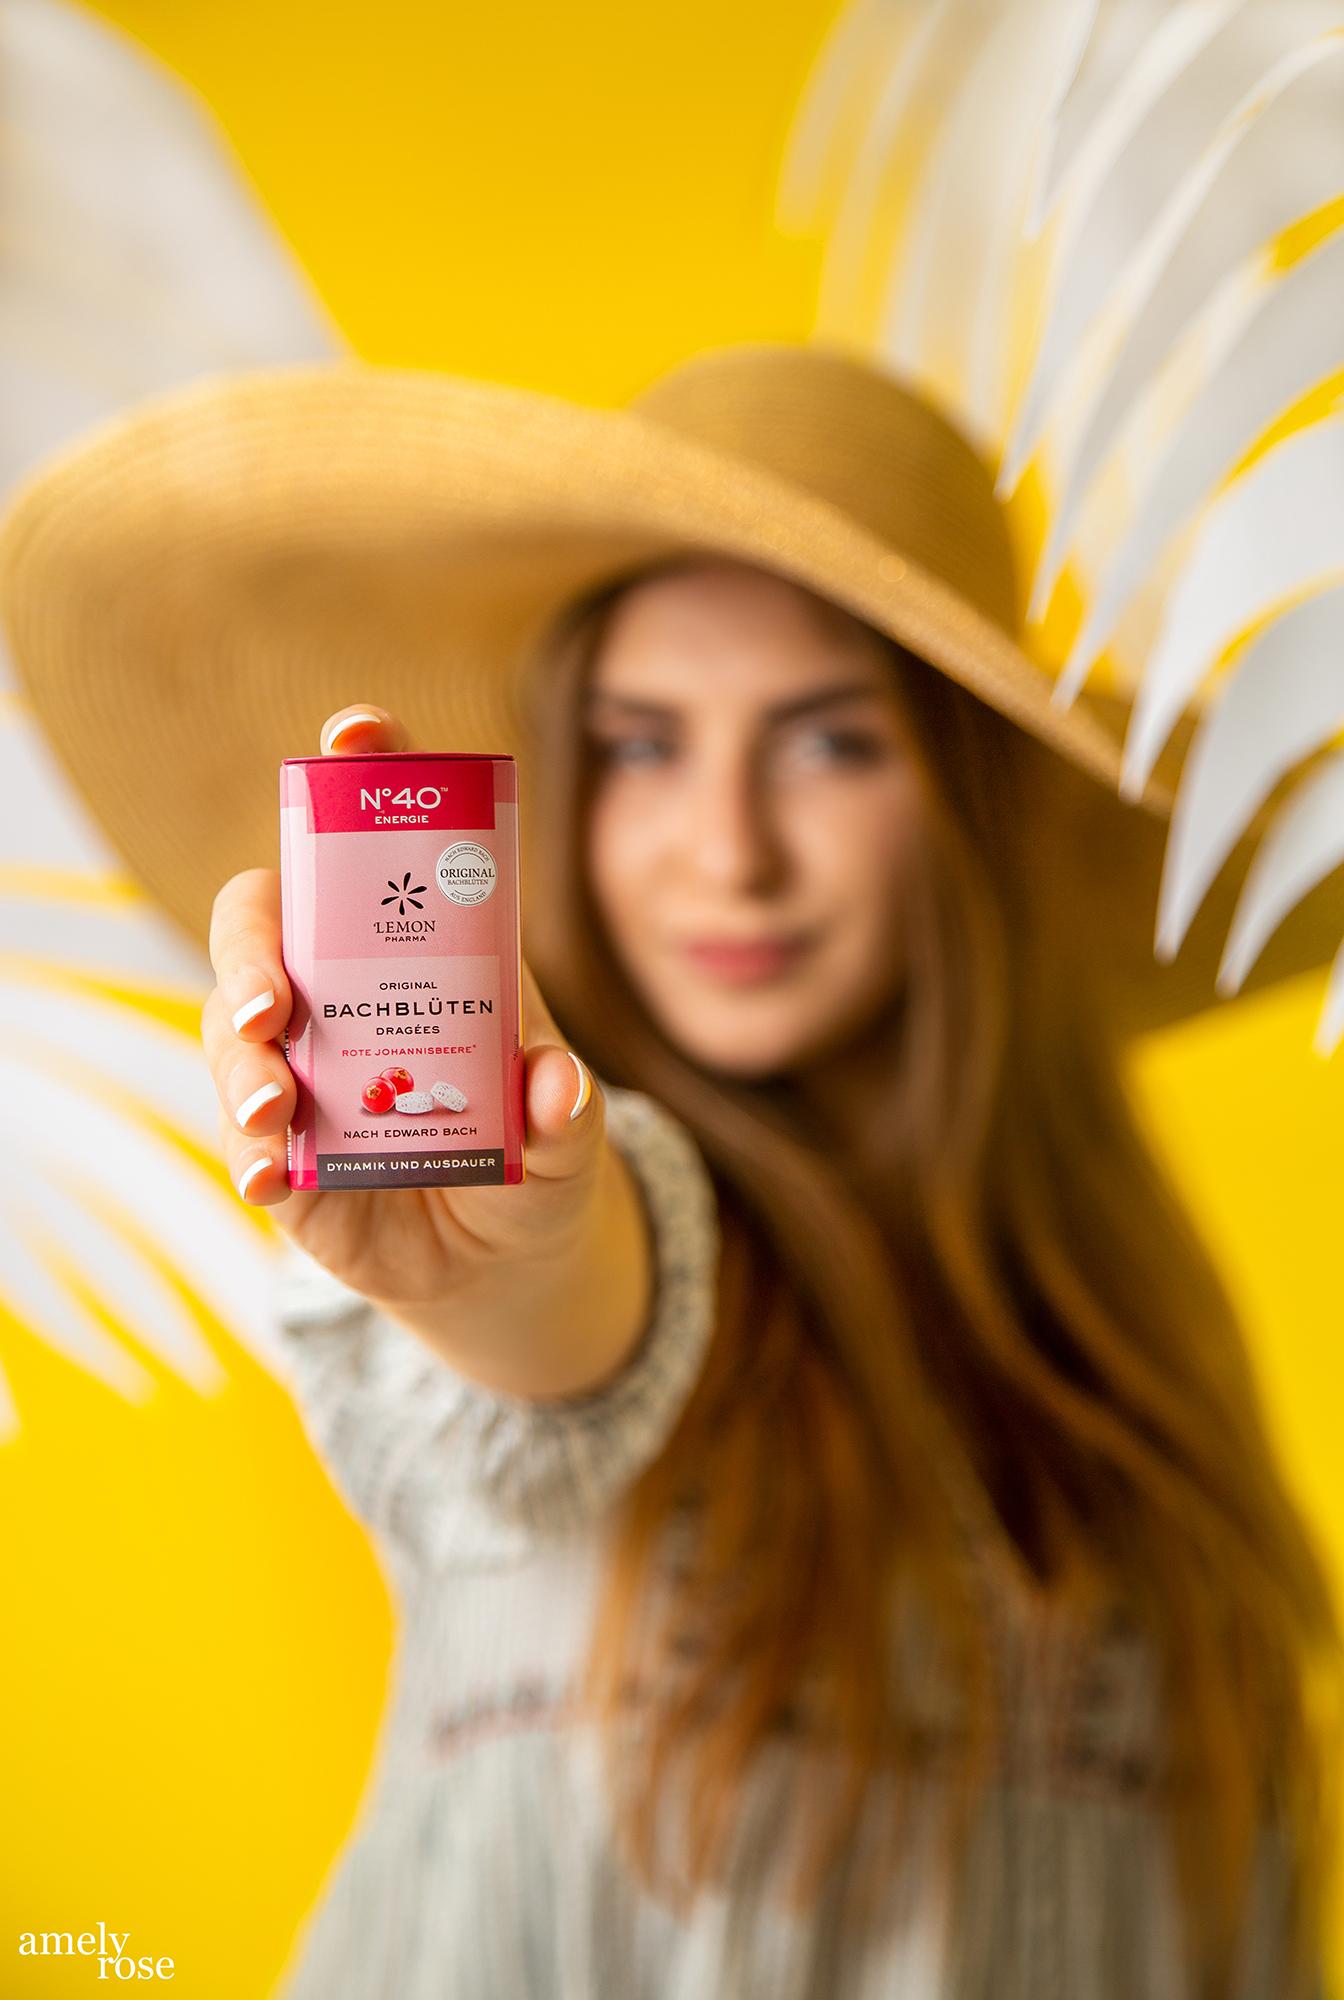 Amely Rose Beautyblogger unboxing beautybox medikamente-per-klick versandapotheke reiseapotheke summermusthaves sommerpflege